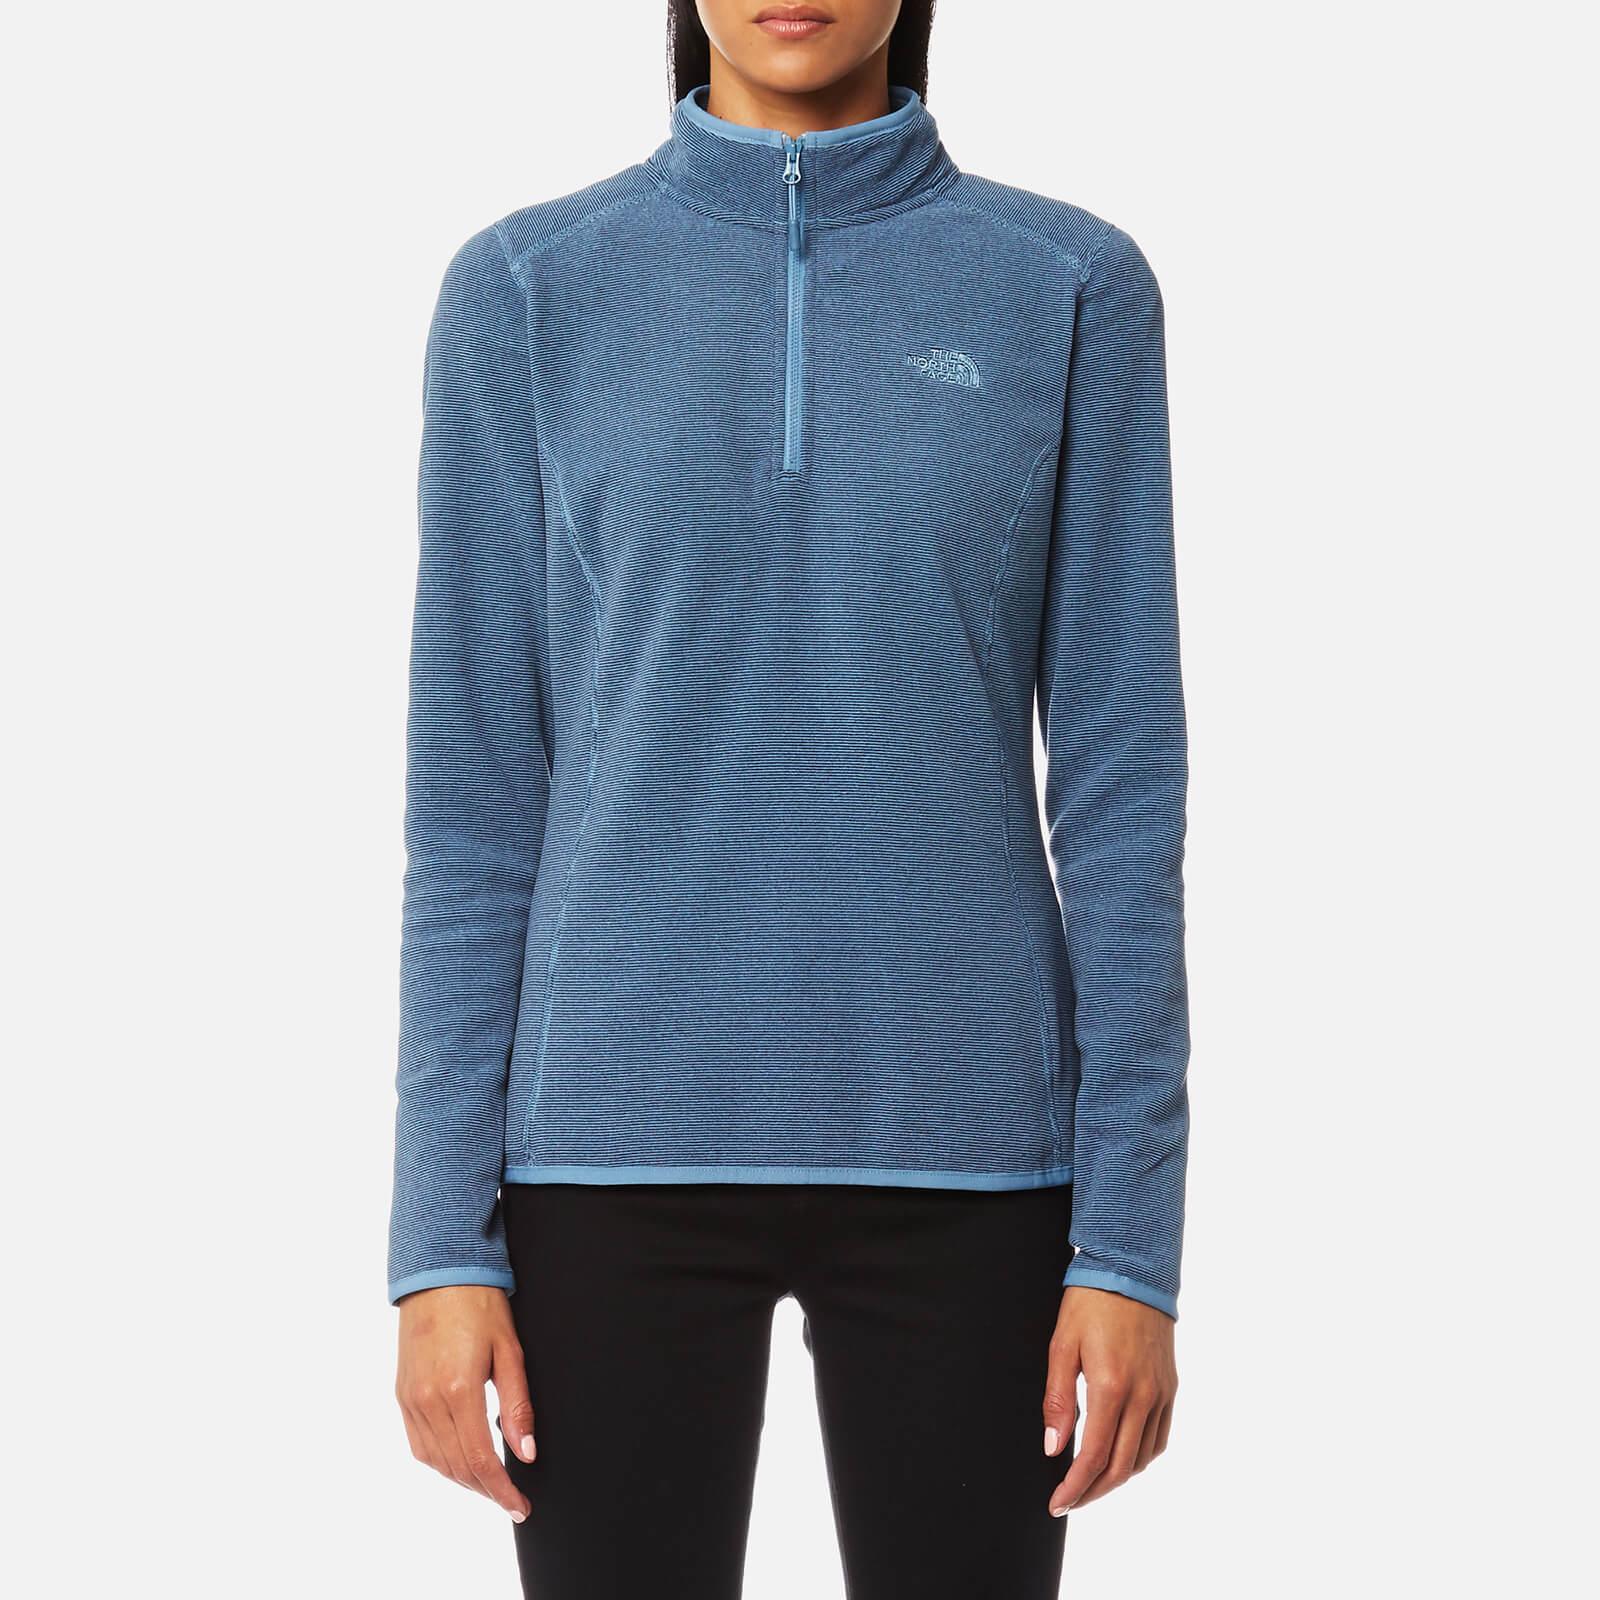 5e3967569e7 The North Face Women s 100 Glacier 1 4 Zip Fleece Jumper - Provincial Blue  Stripe Womens Clothing